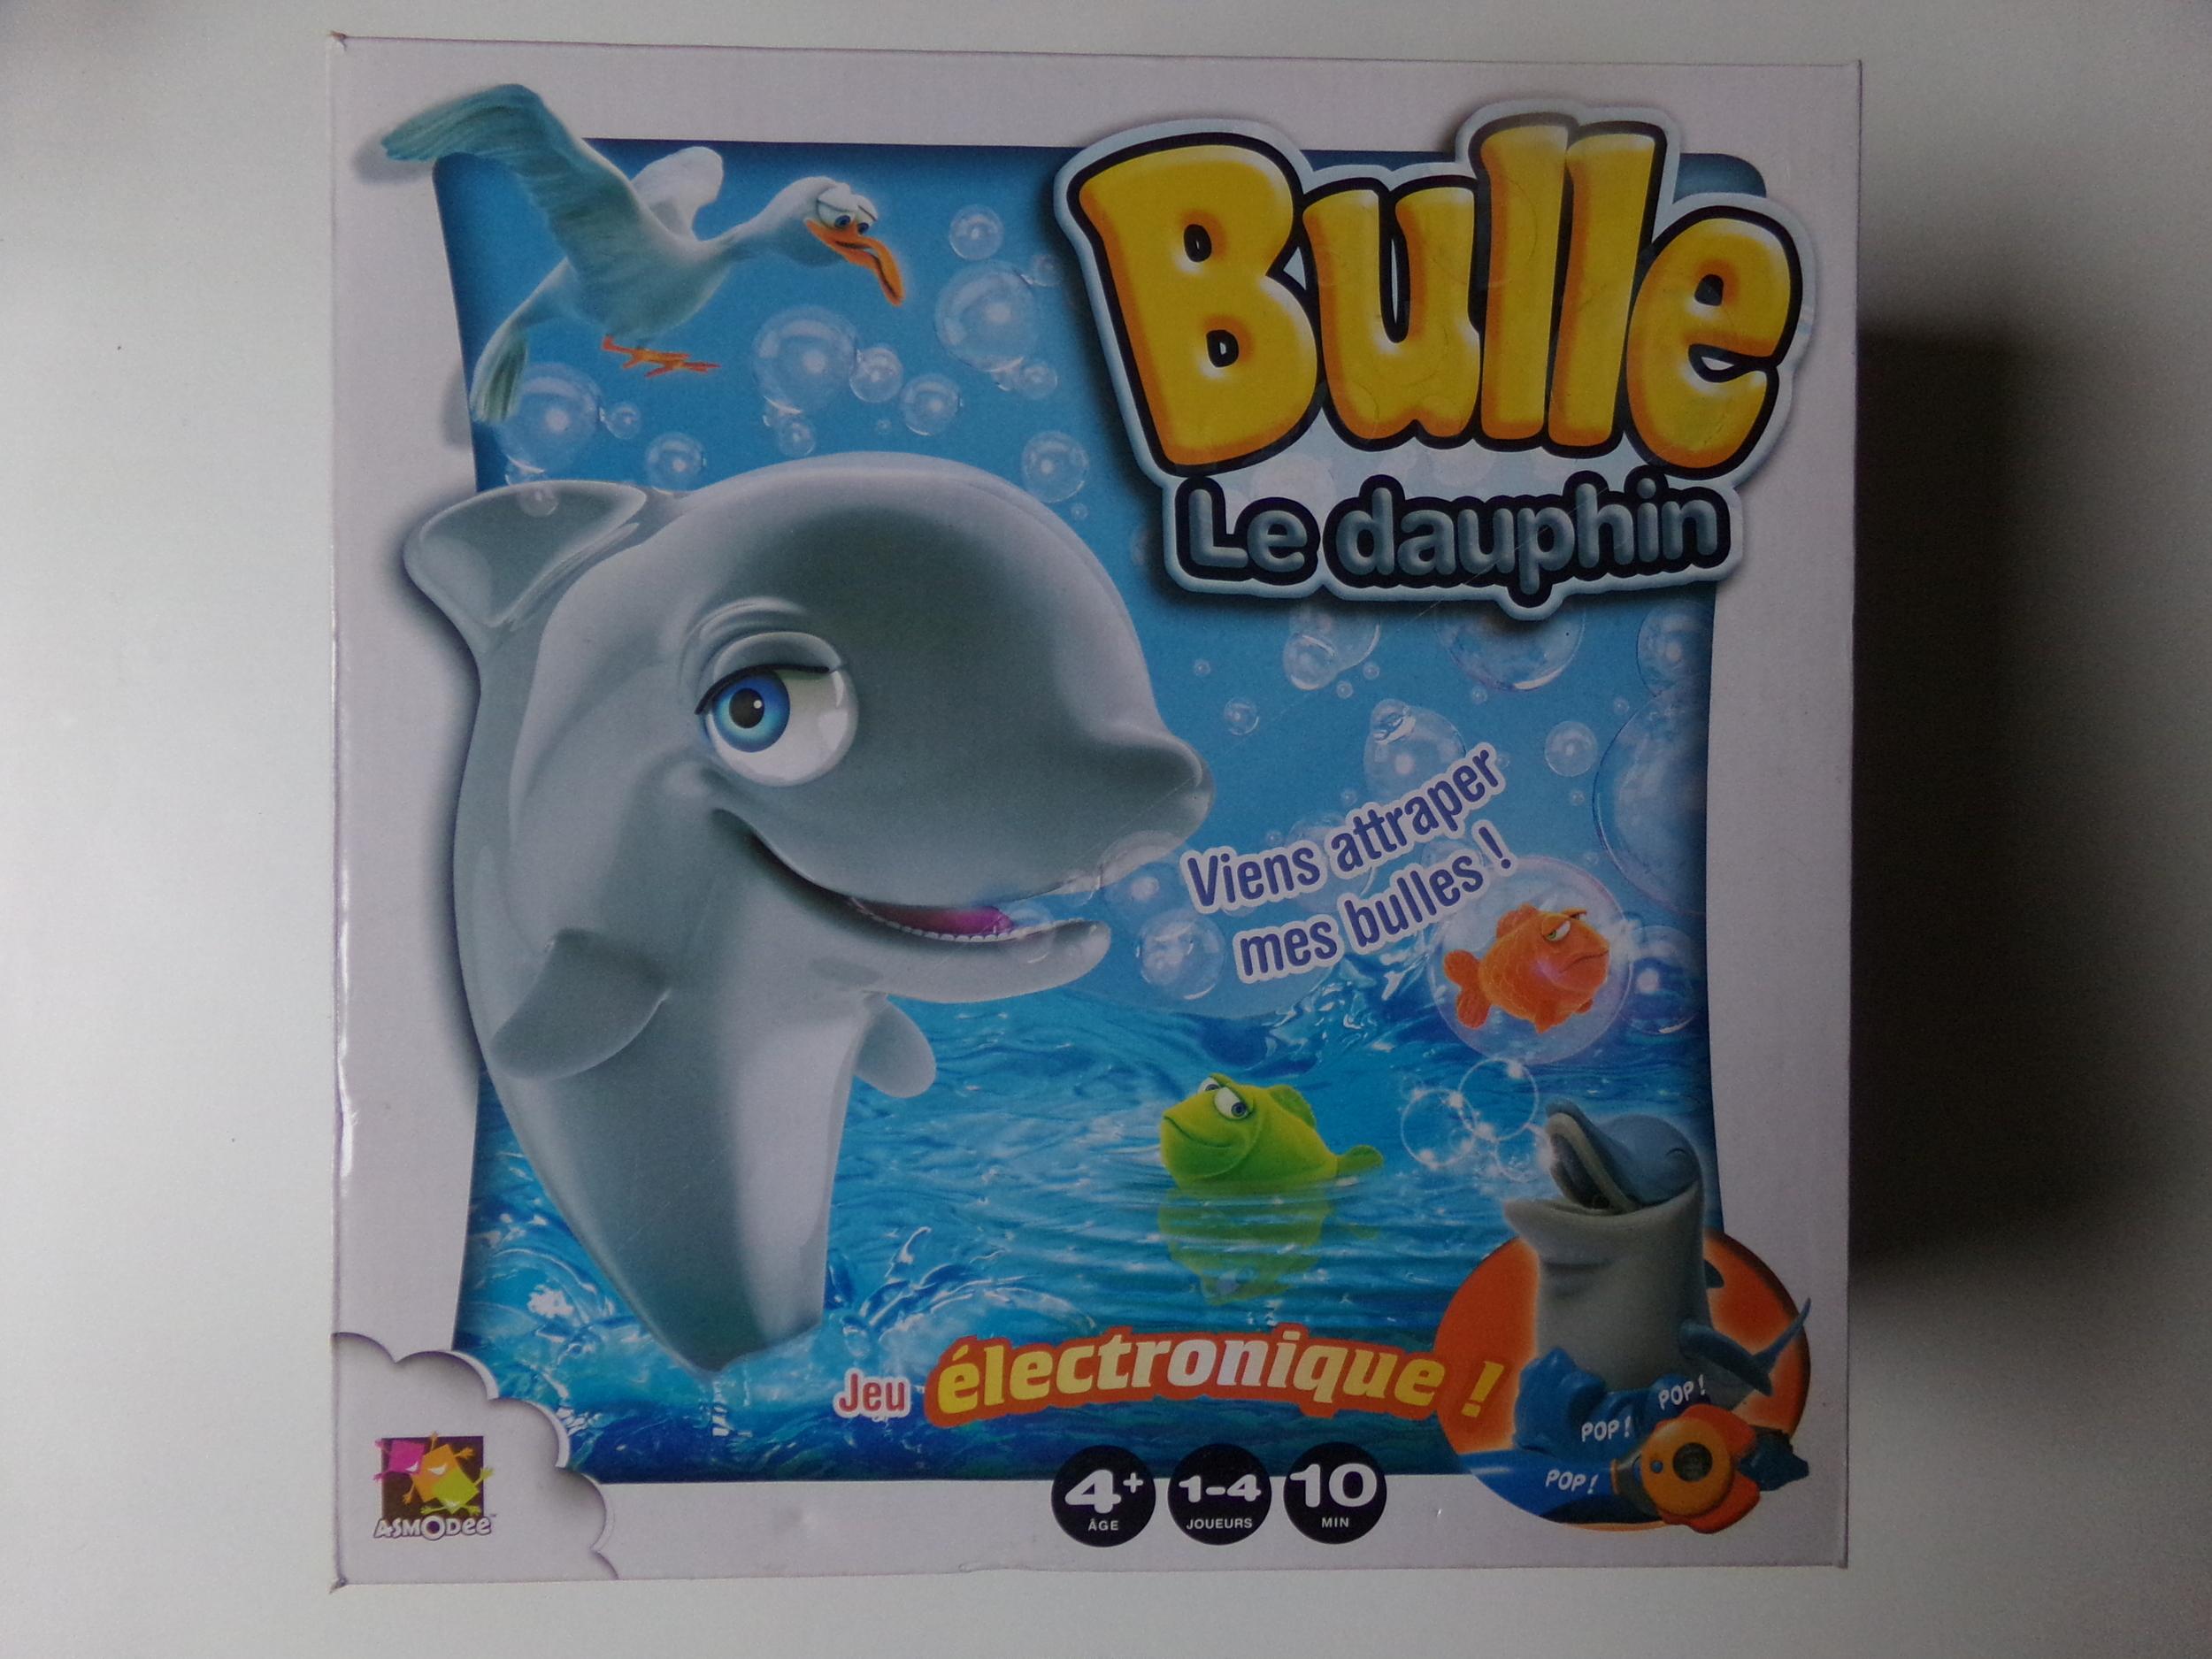 Bulle le dauphin